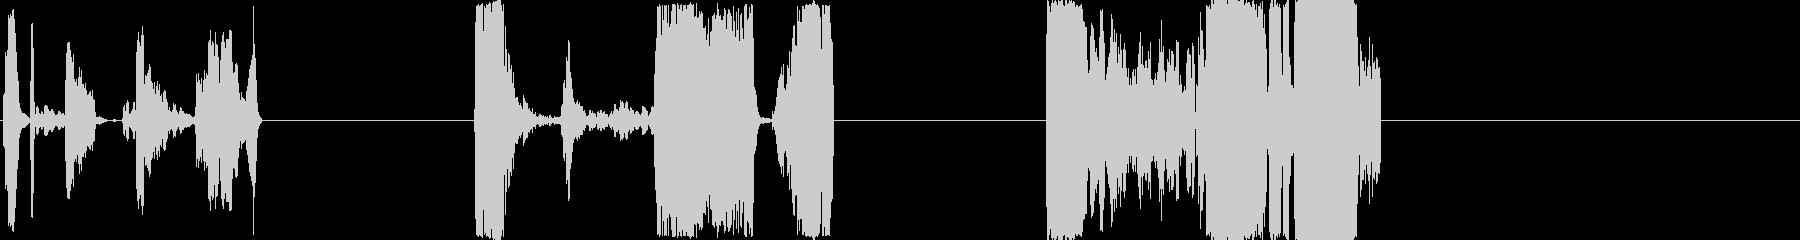 DJループX3の未再生の波形